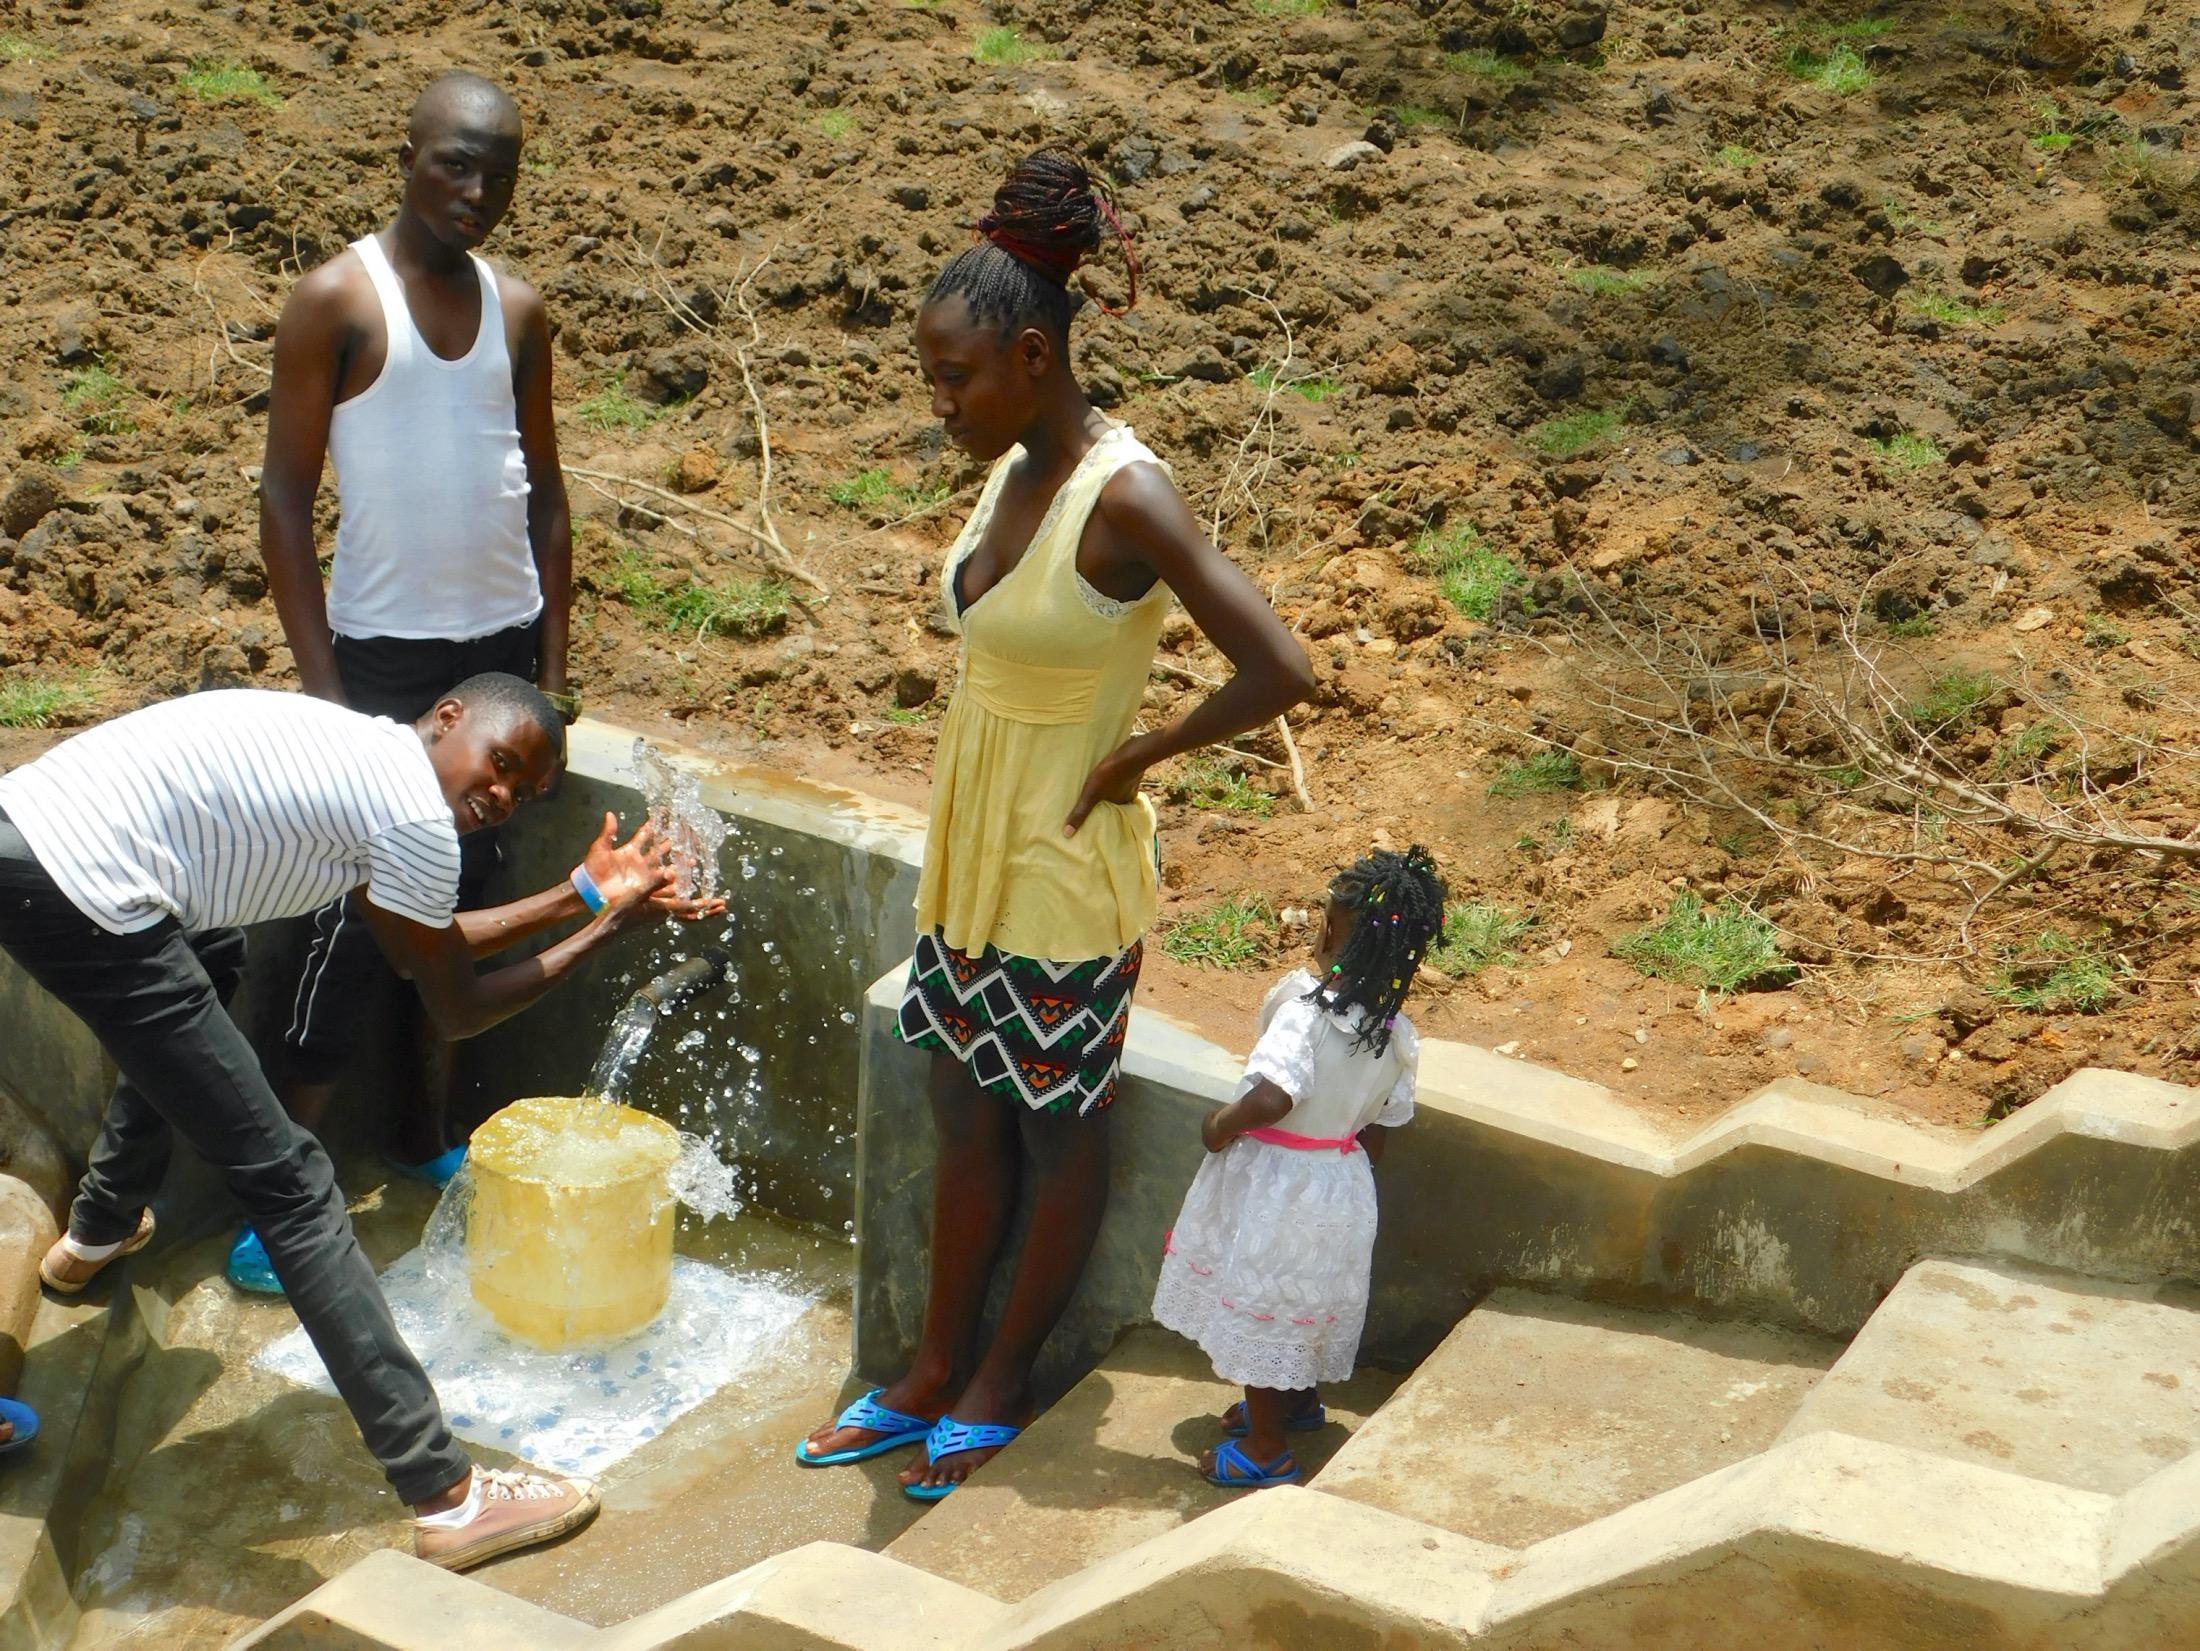 The Water Project : 55-kenya19160-splash